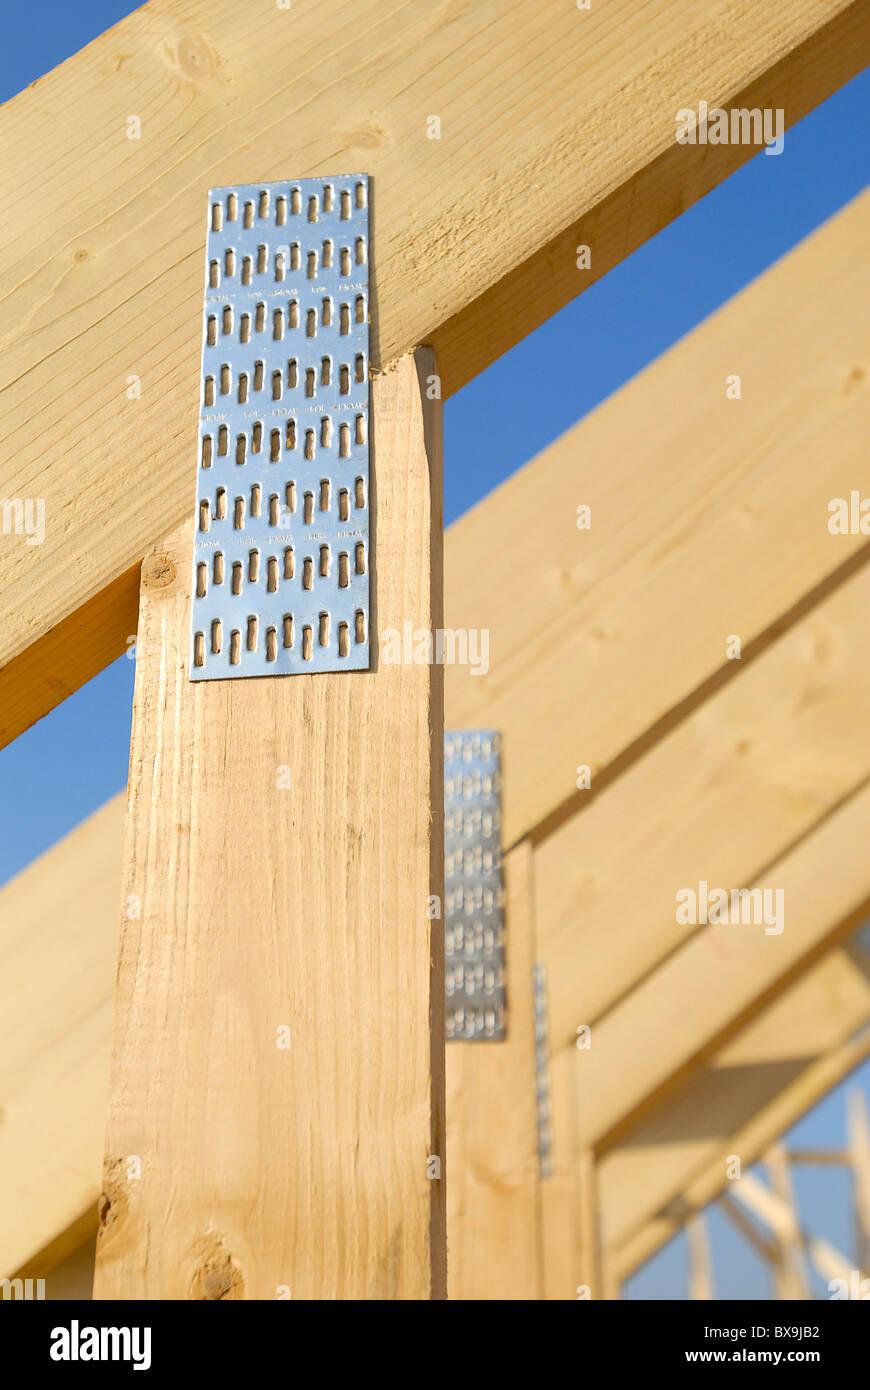 Vigas de techo detalle Imagen De Stock